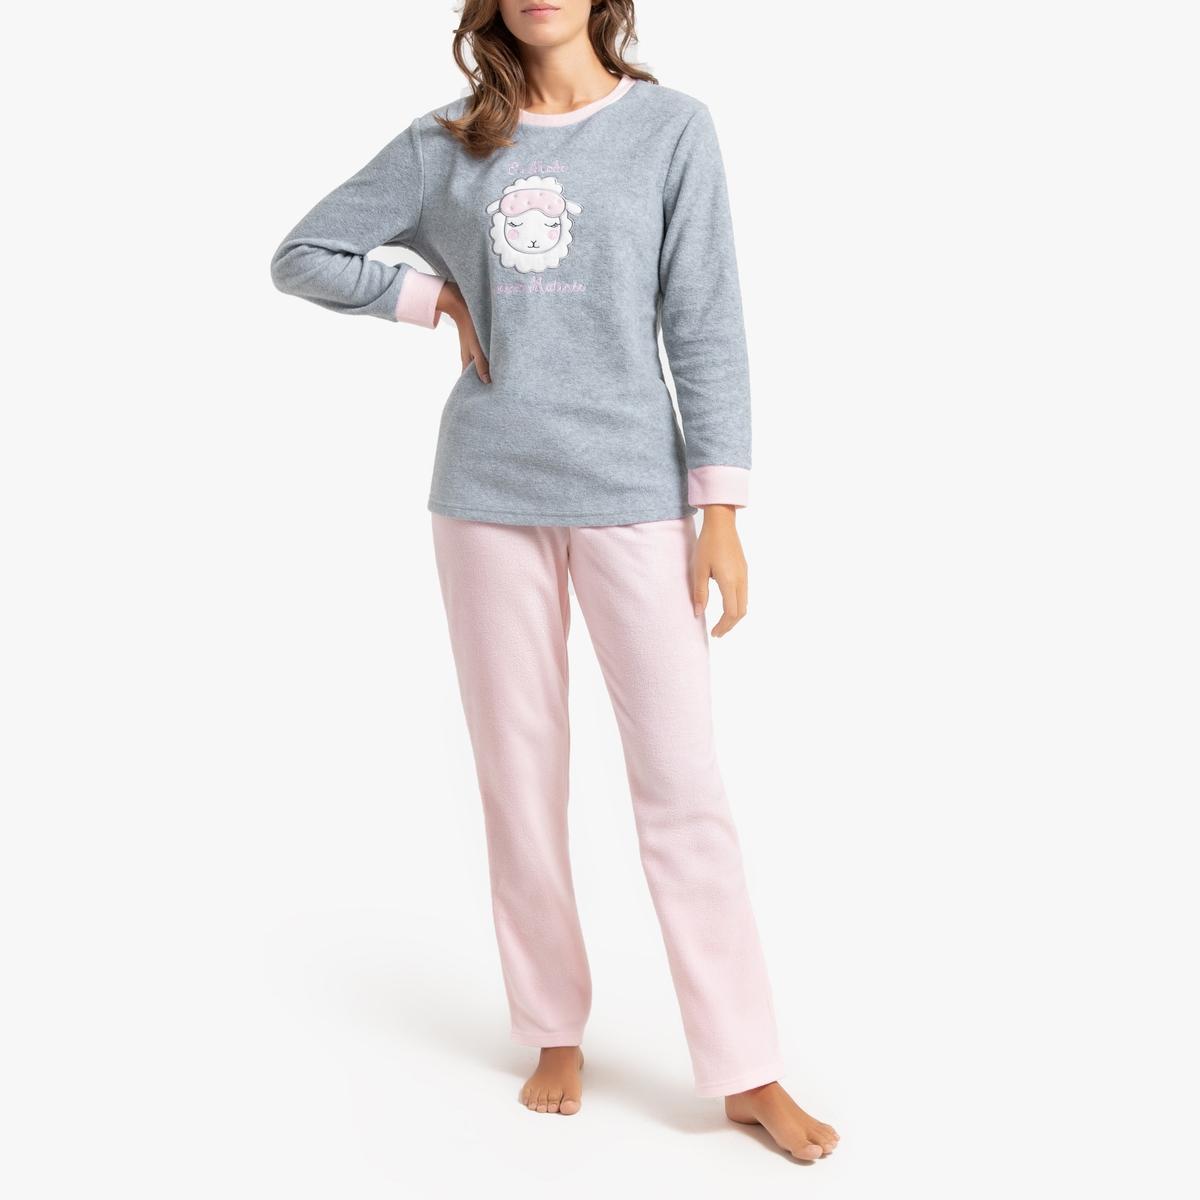 Pijama en tejido micropolar